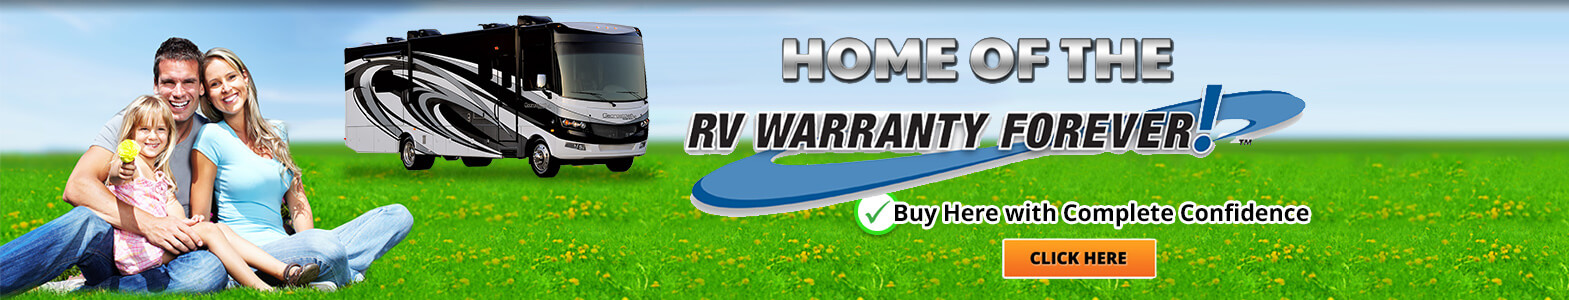 RV Warranty